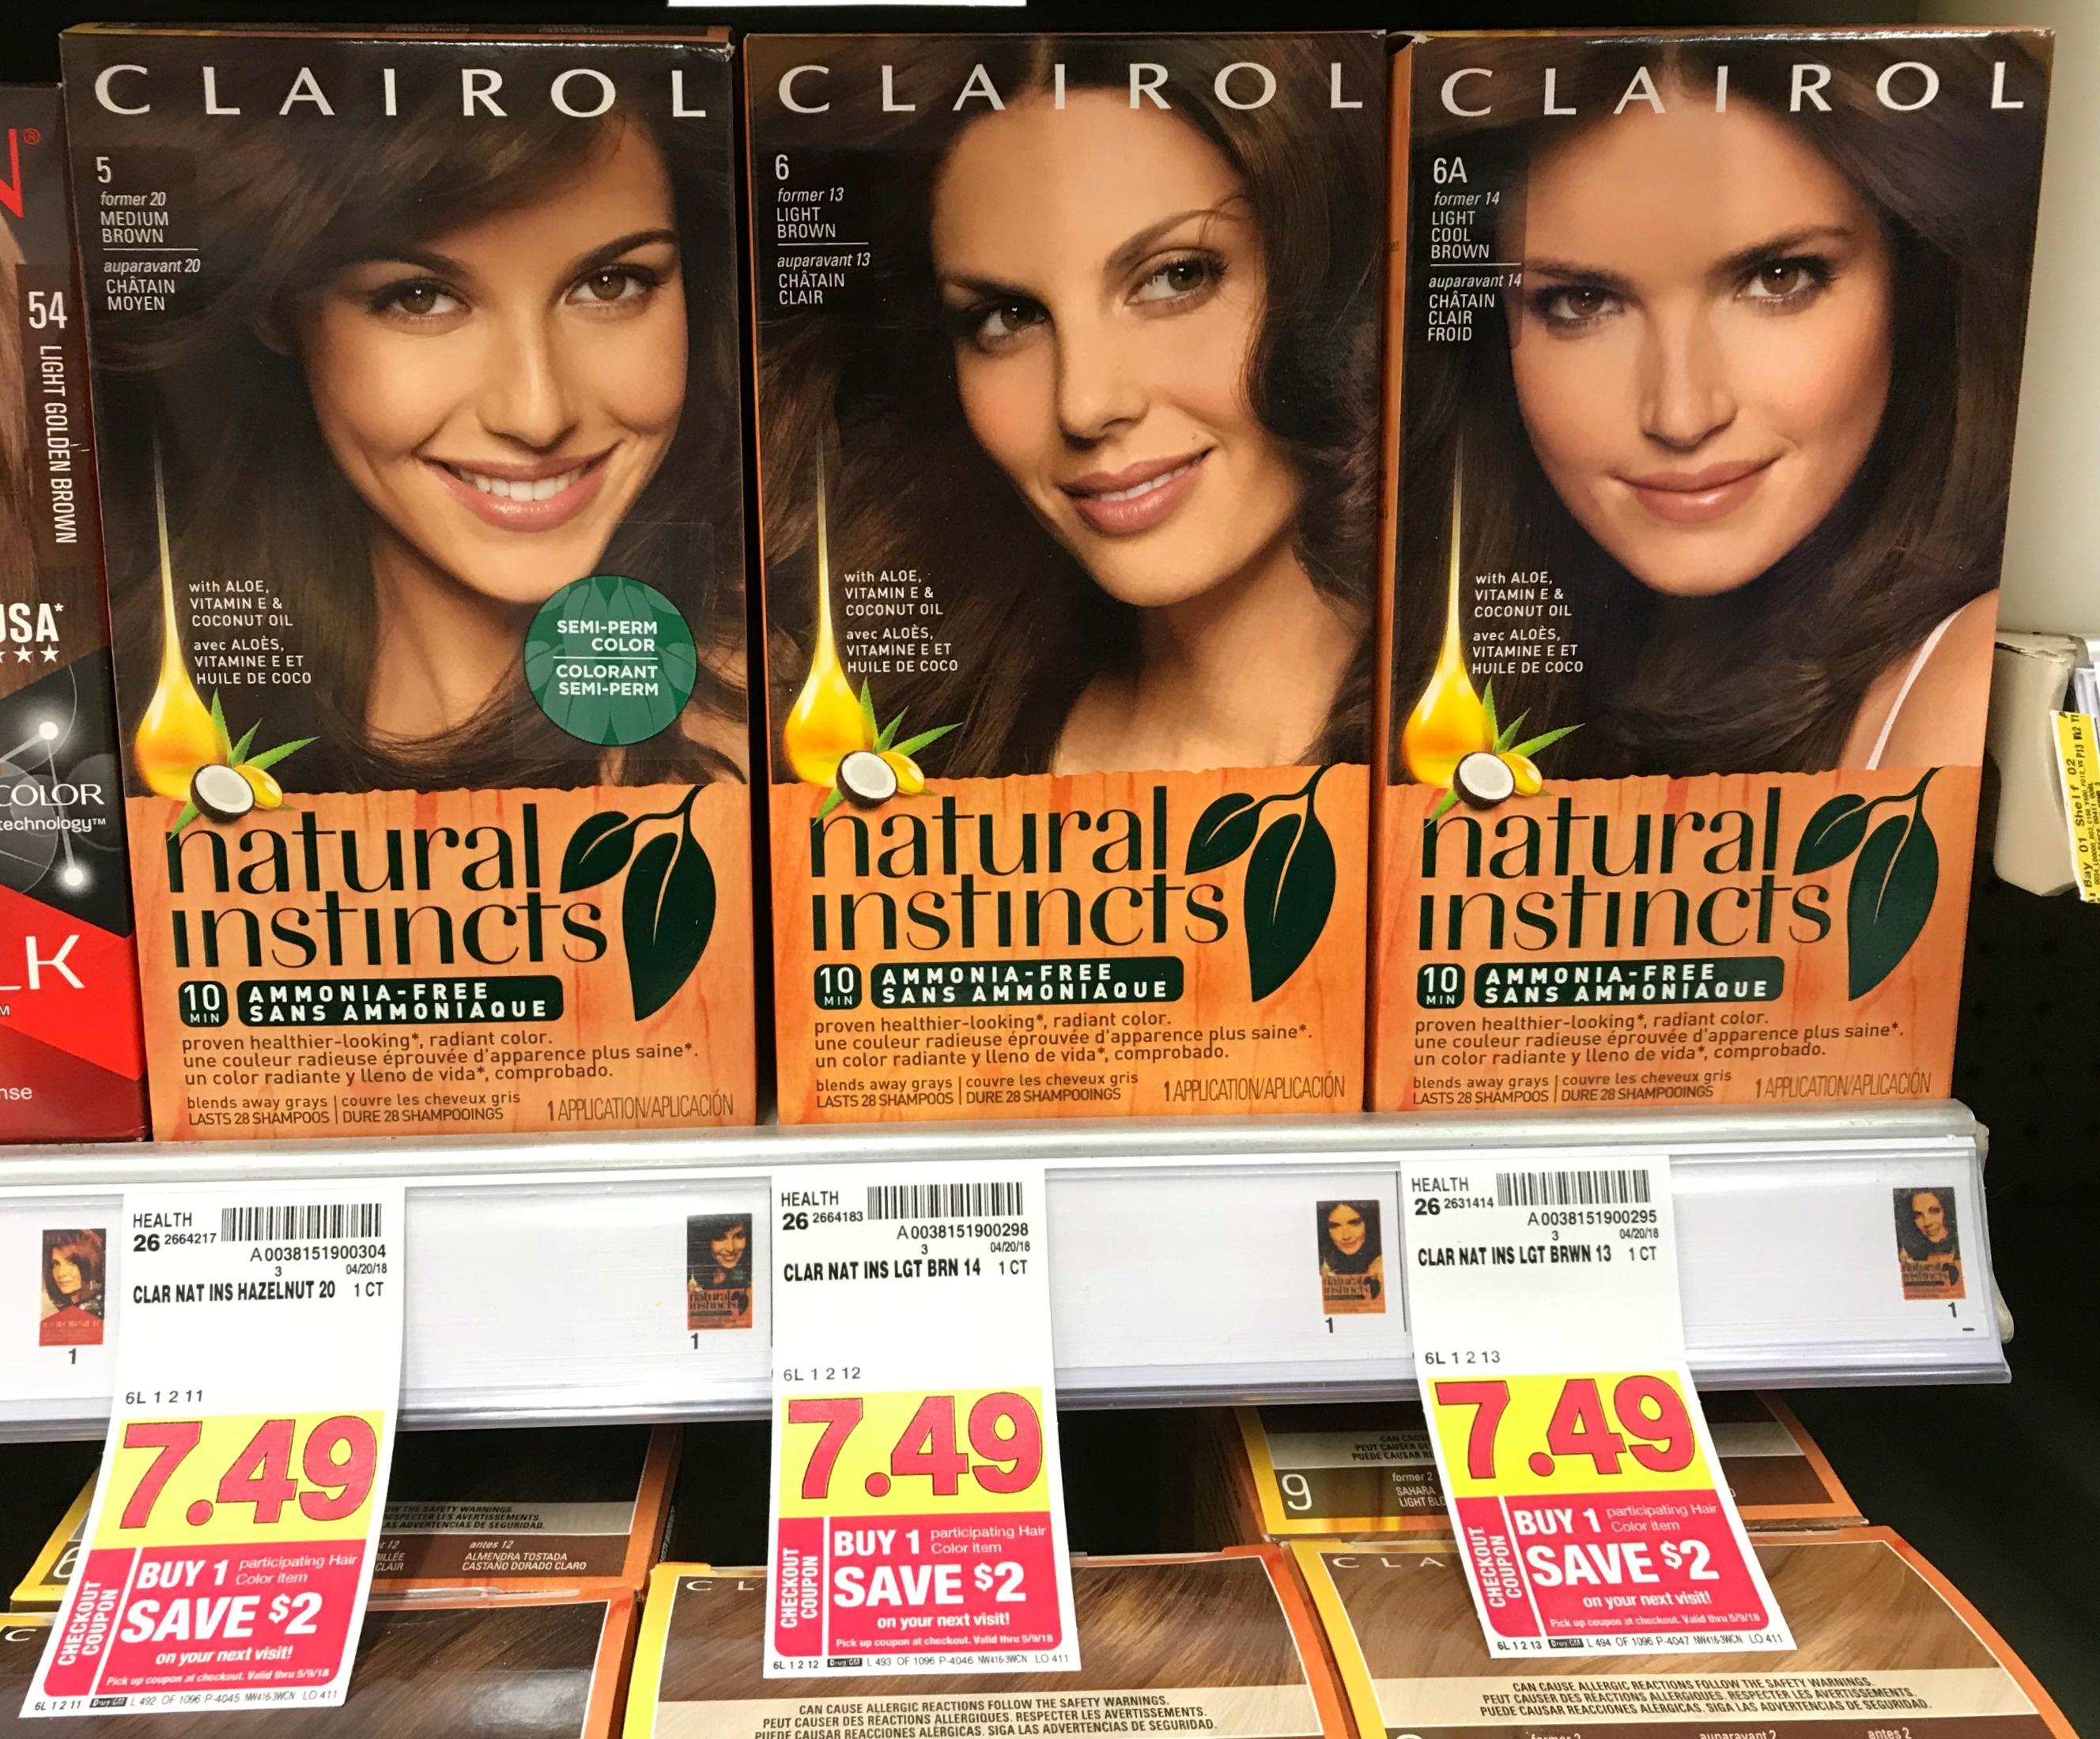 New Clairol Coupon + Catalina = Free Hair Color At Kroger!!   Kroger - Free Hair Dye Coupons Printable